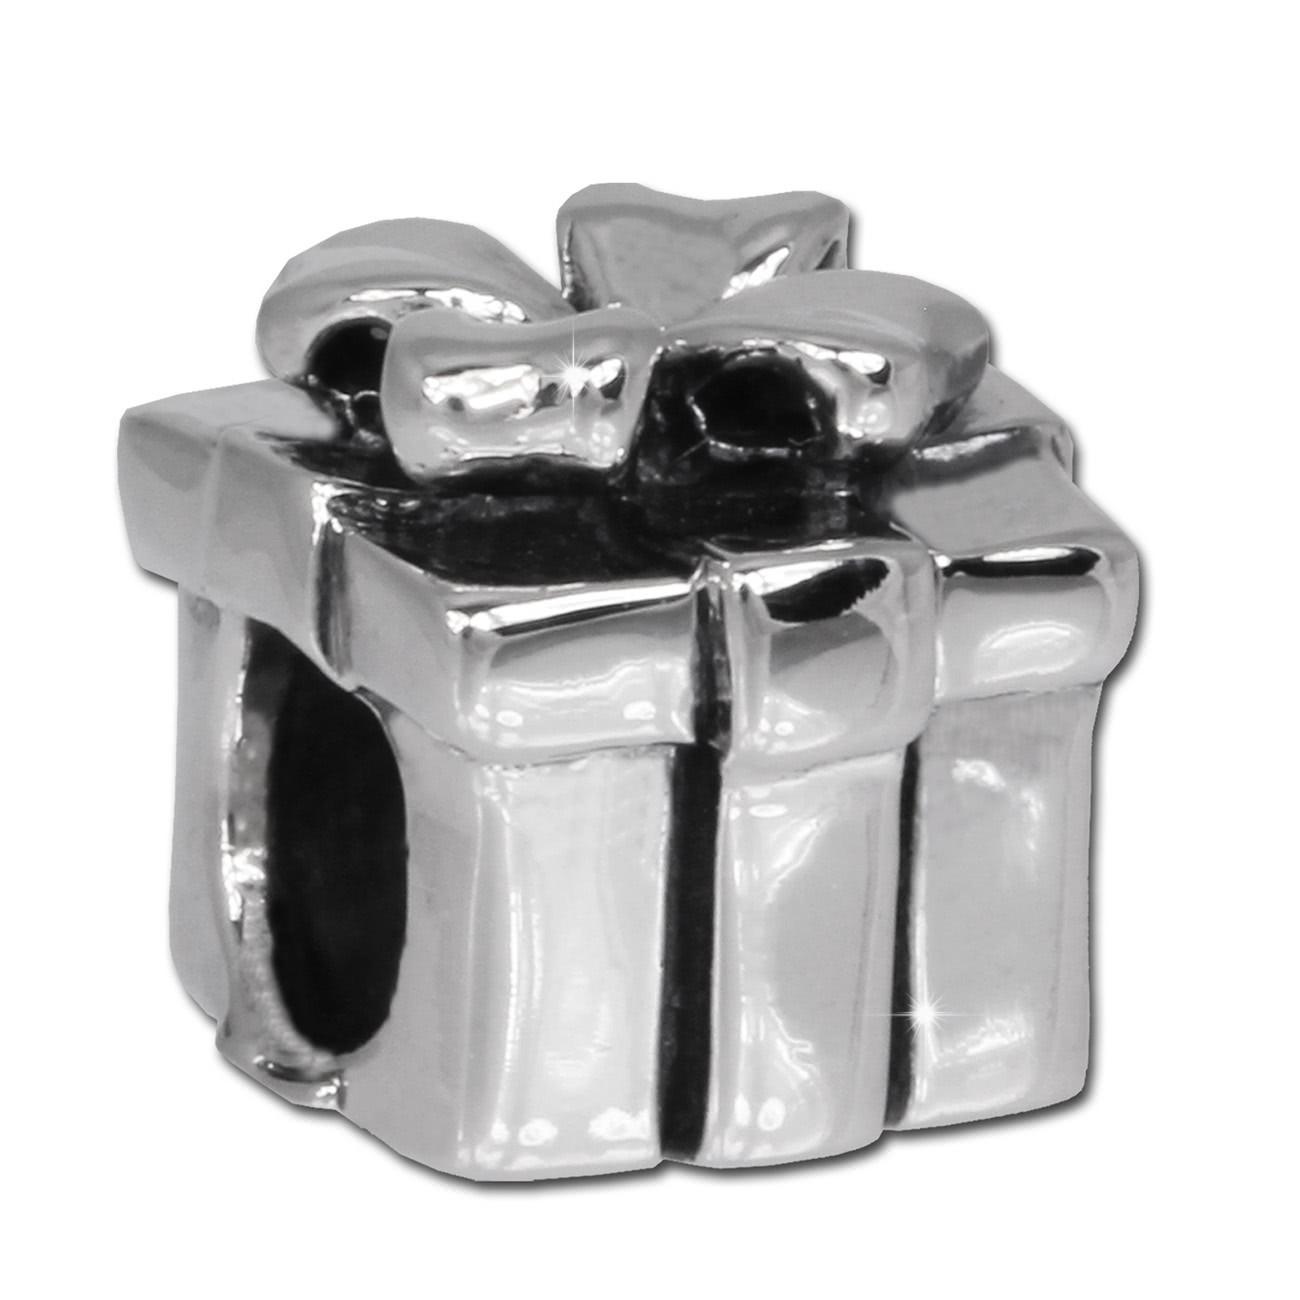 IMPPAC Bead Geschenk 925 Sterling Silber Armband Beads SBB603